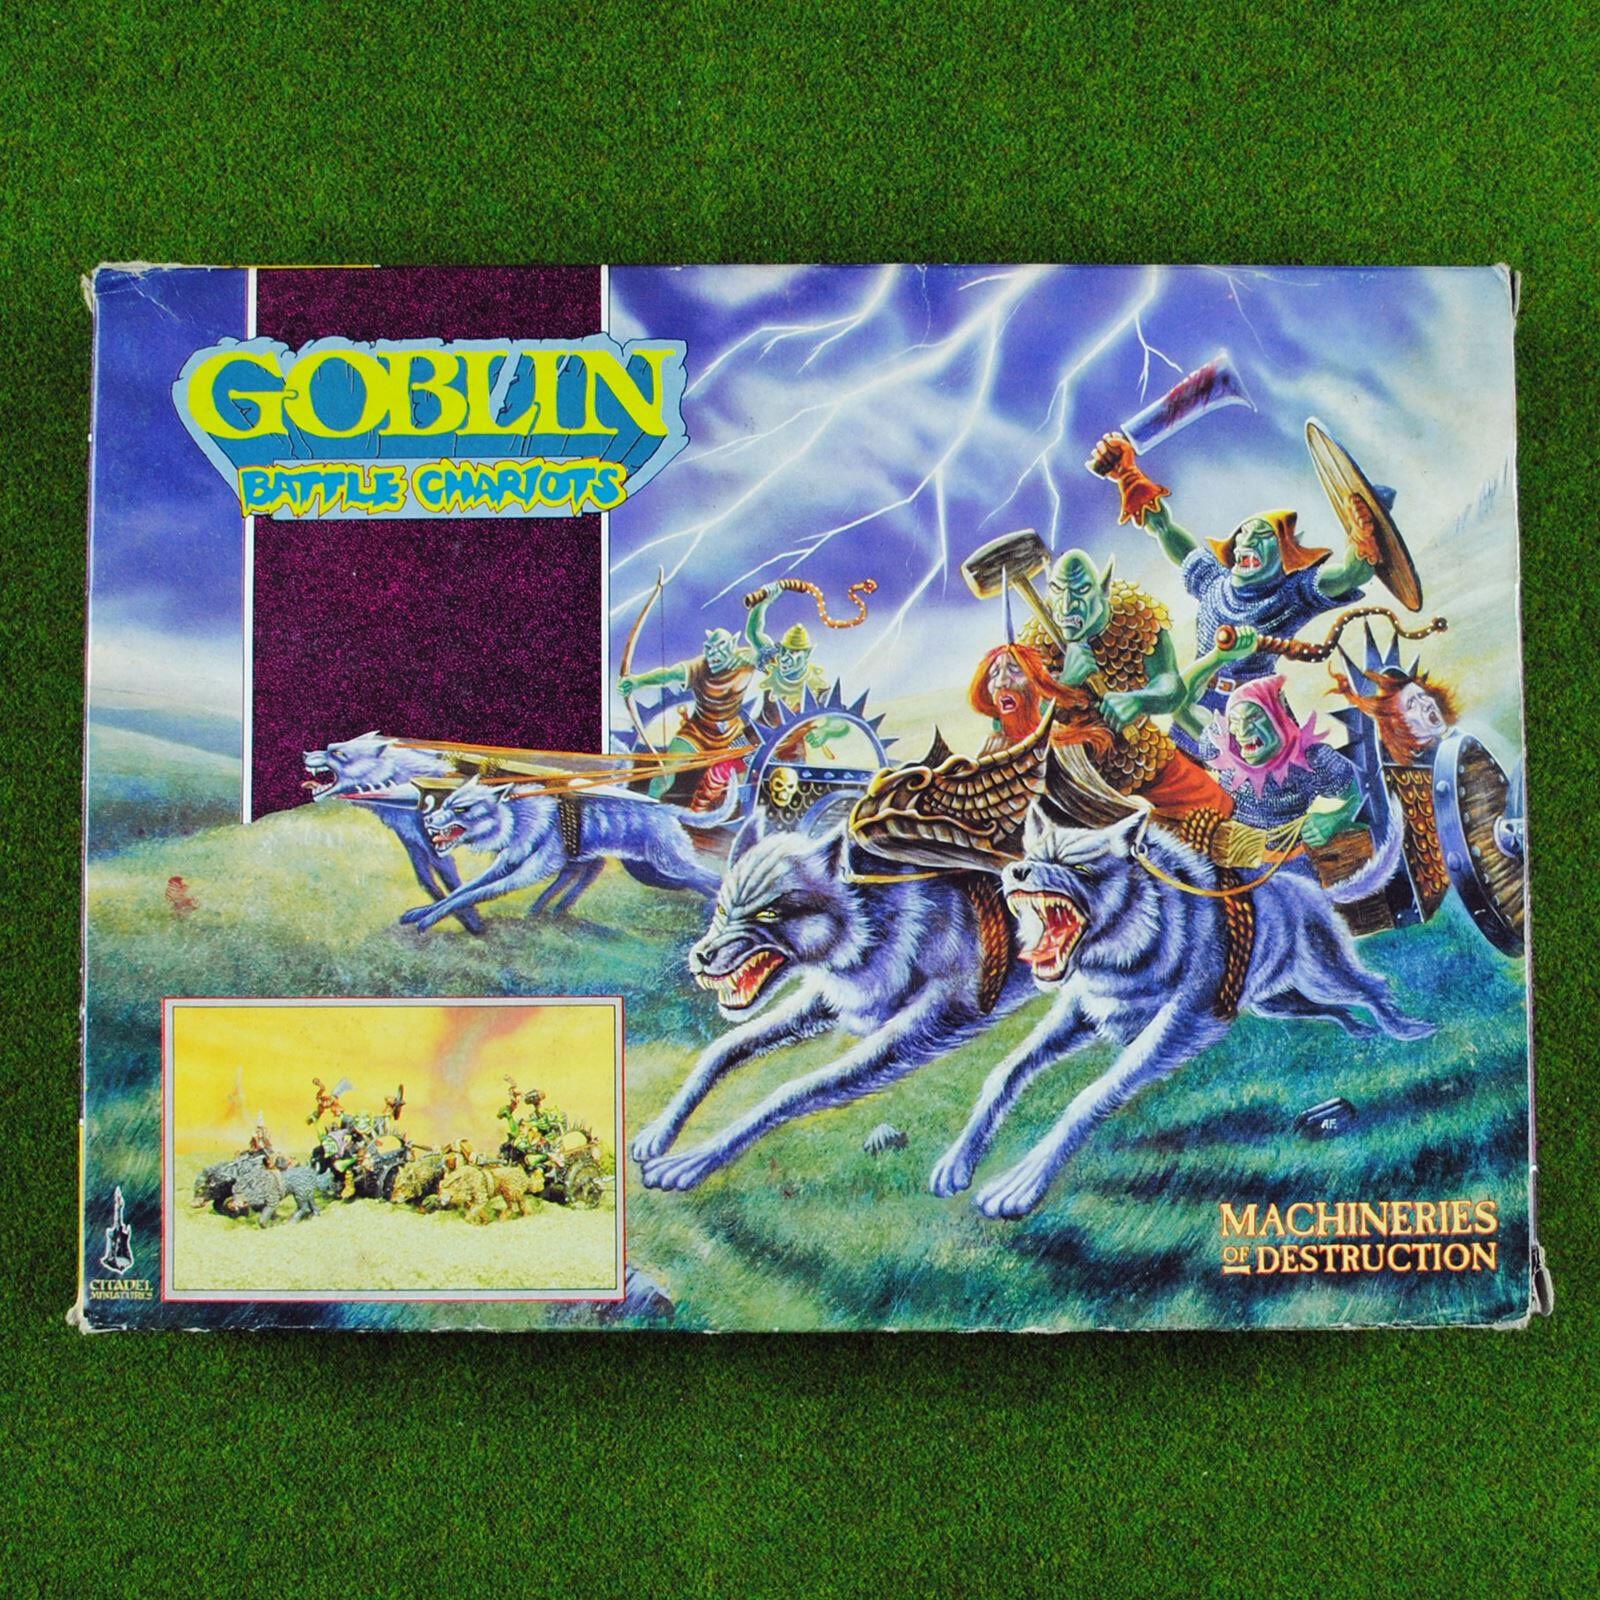 Warhammer Classic Citadel Goblin Battle Battle Battle Chariots, Metal Rare OOP Goblins Chariot dcd9de